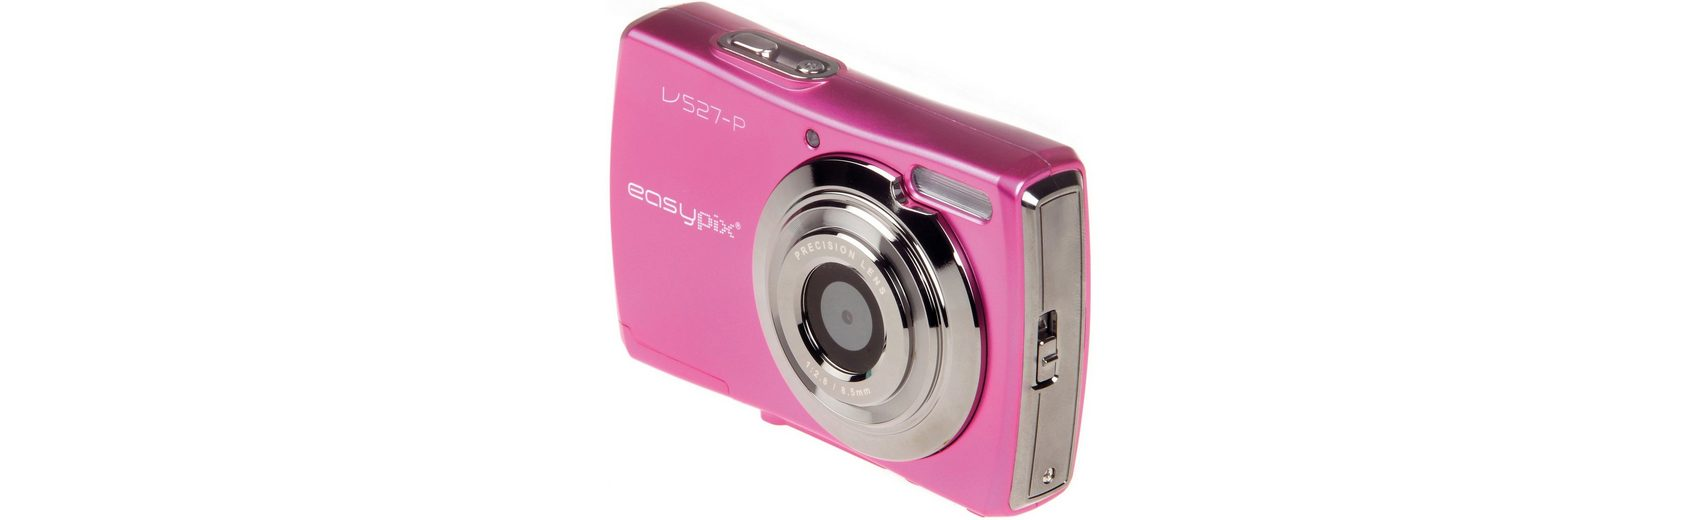 "Easypix Digitalkamera V527-P ""Candy"" Pink"